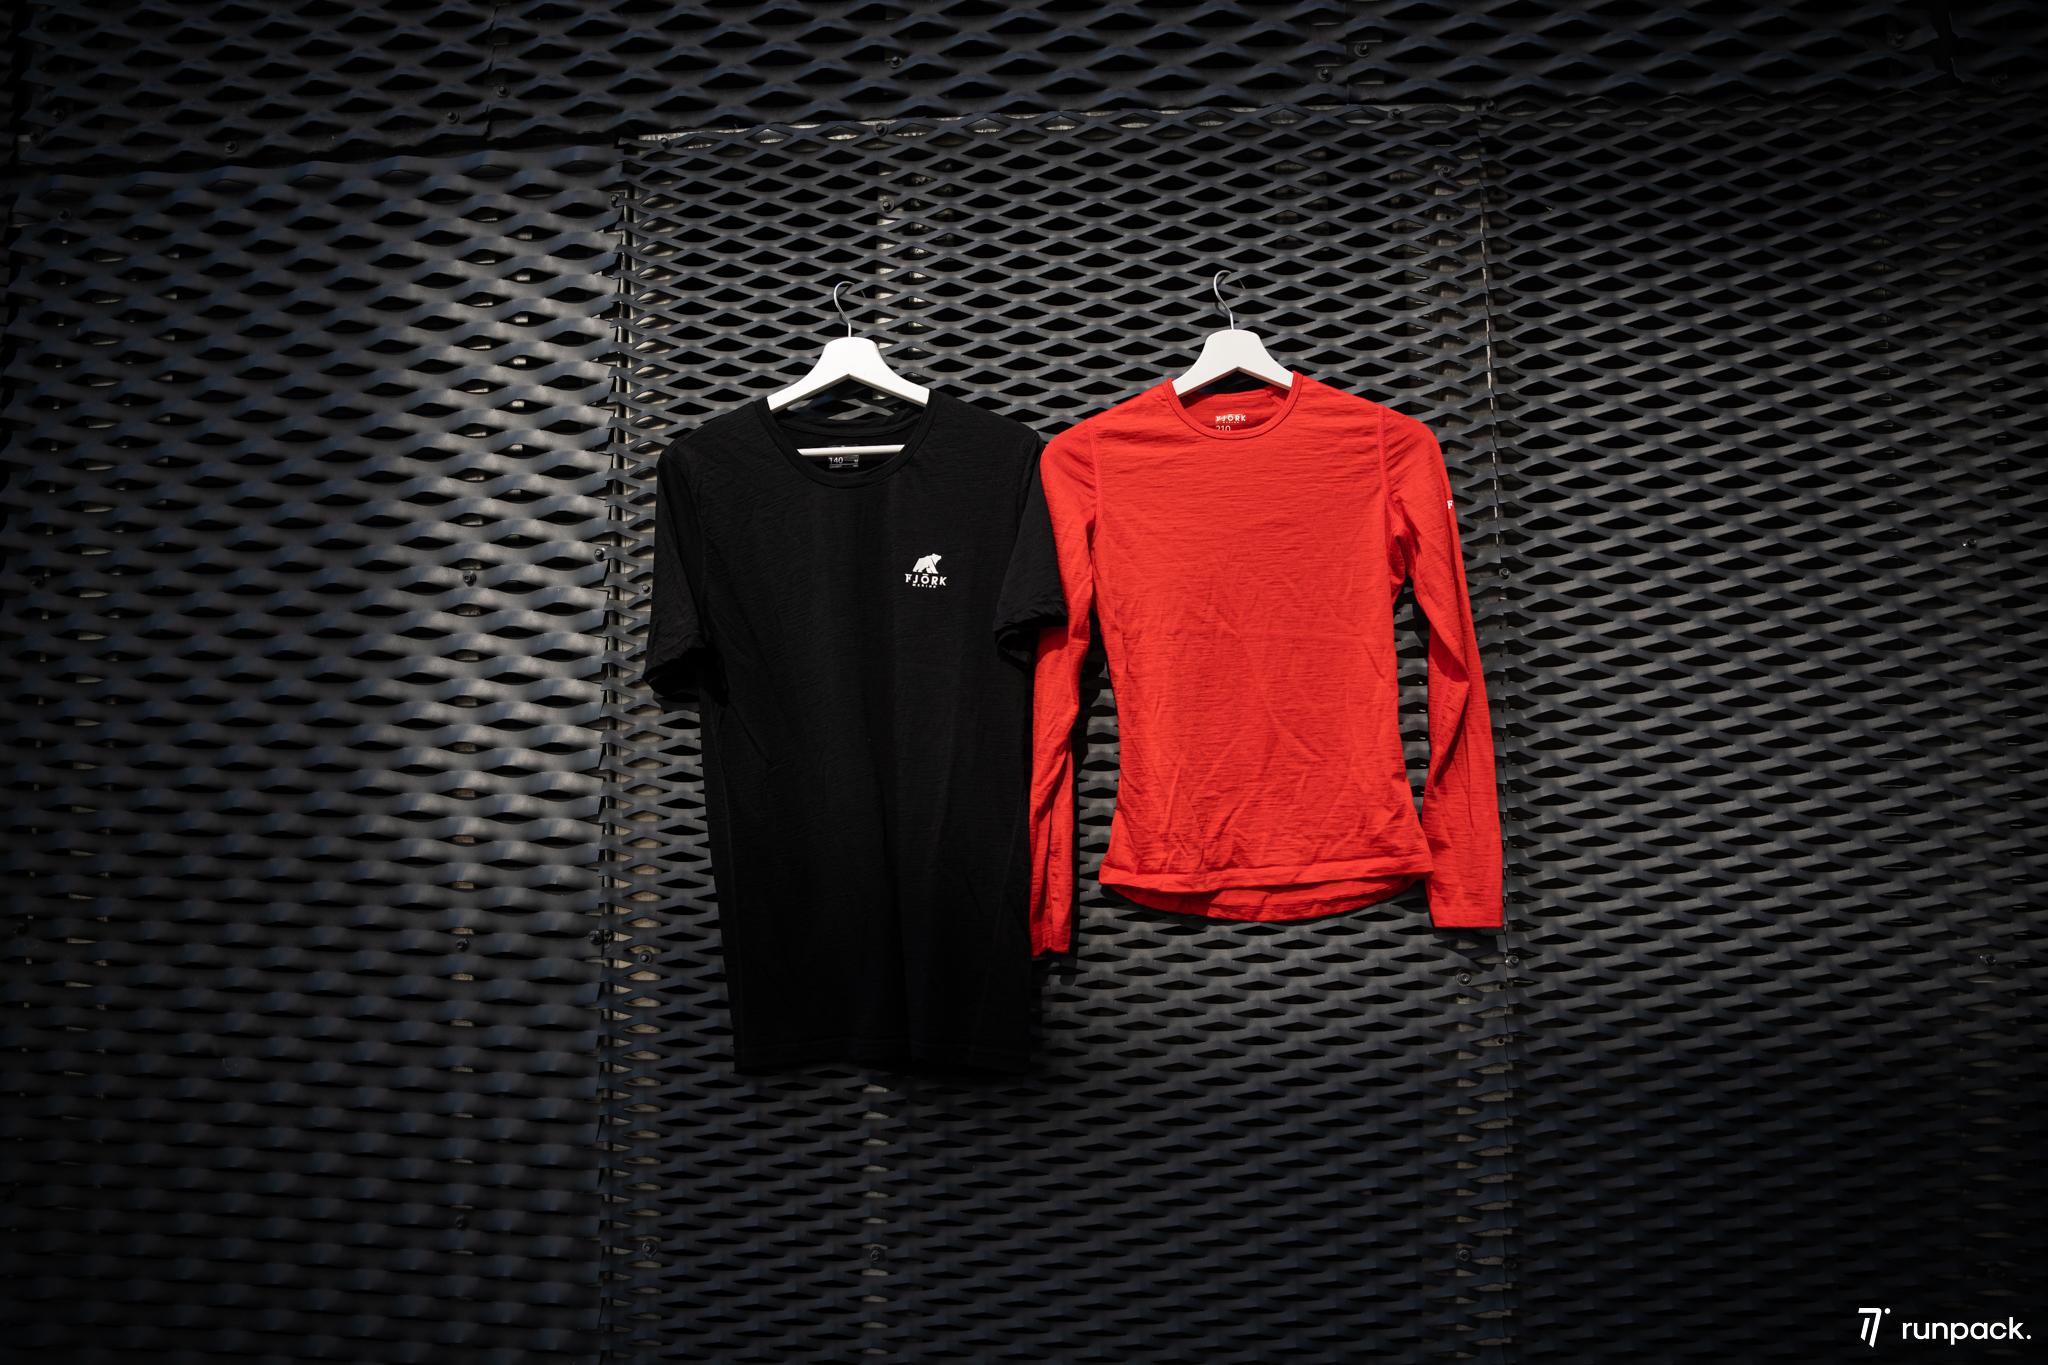 test tshirt fjork merinos runpack